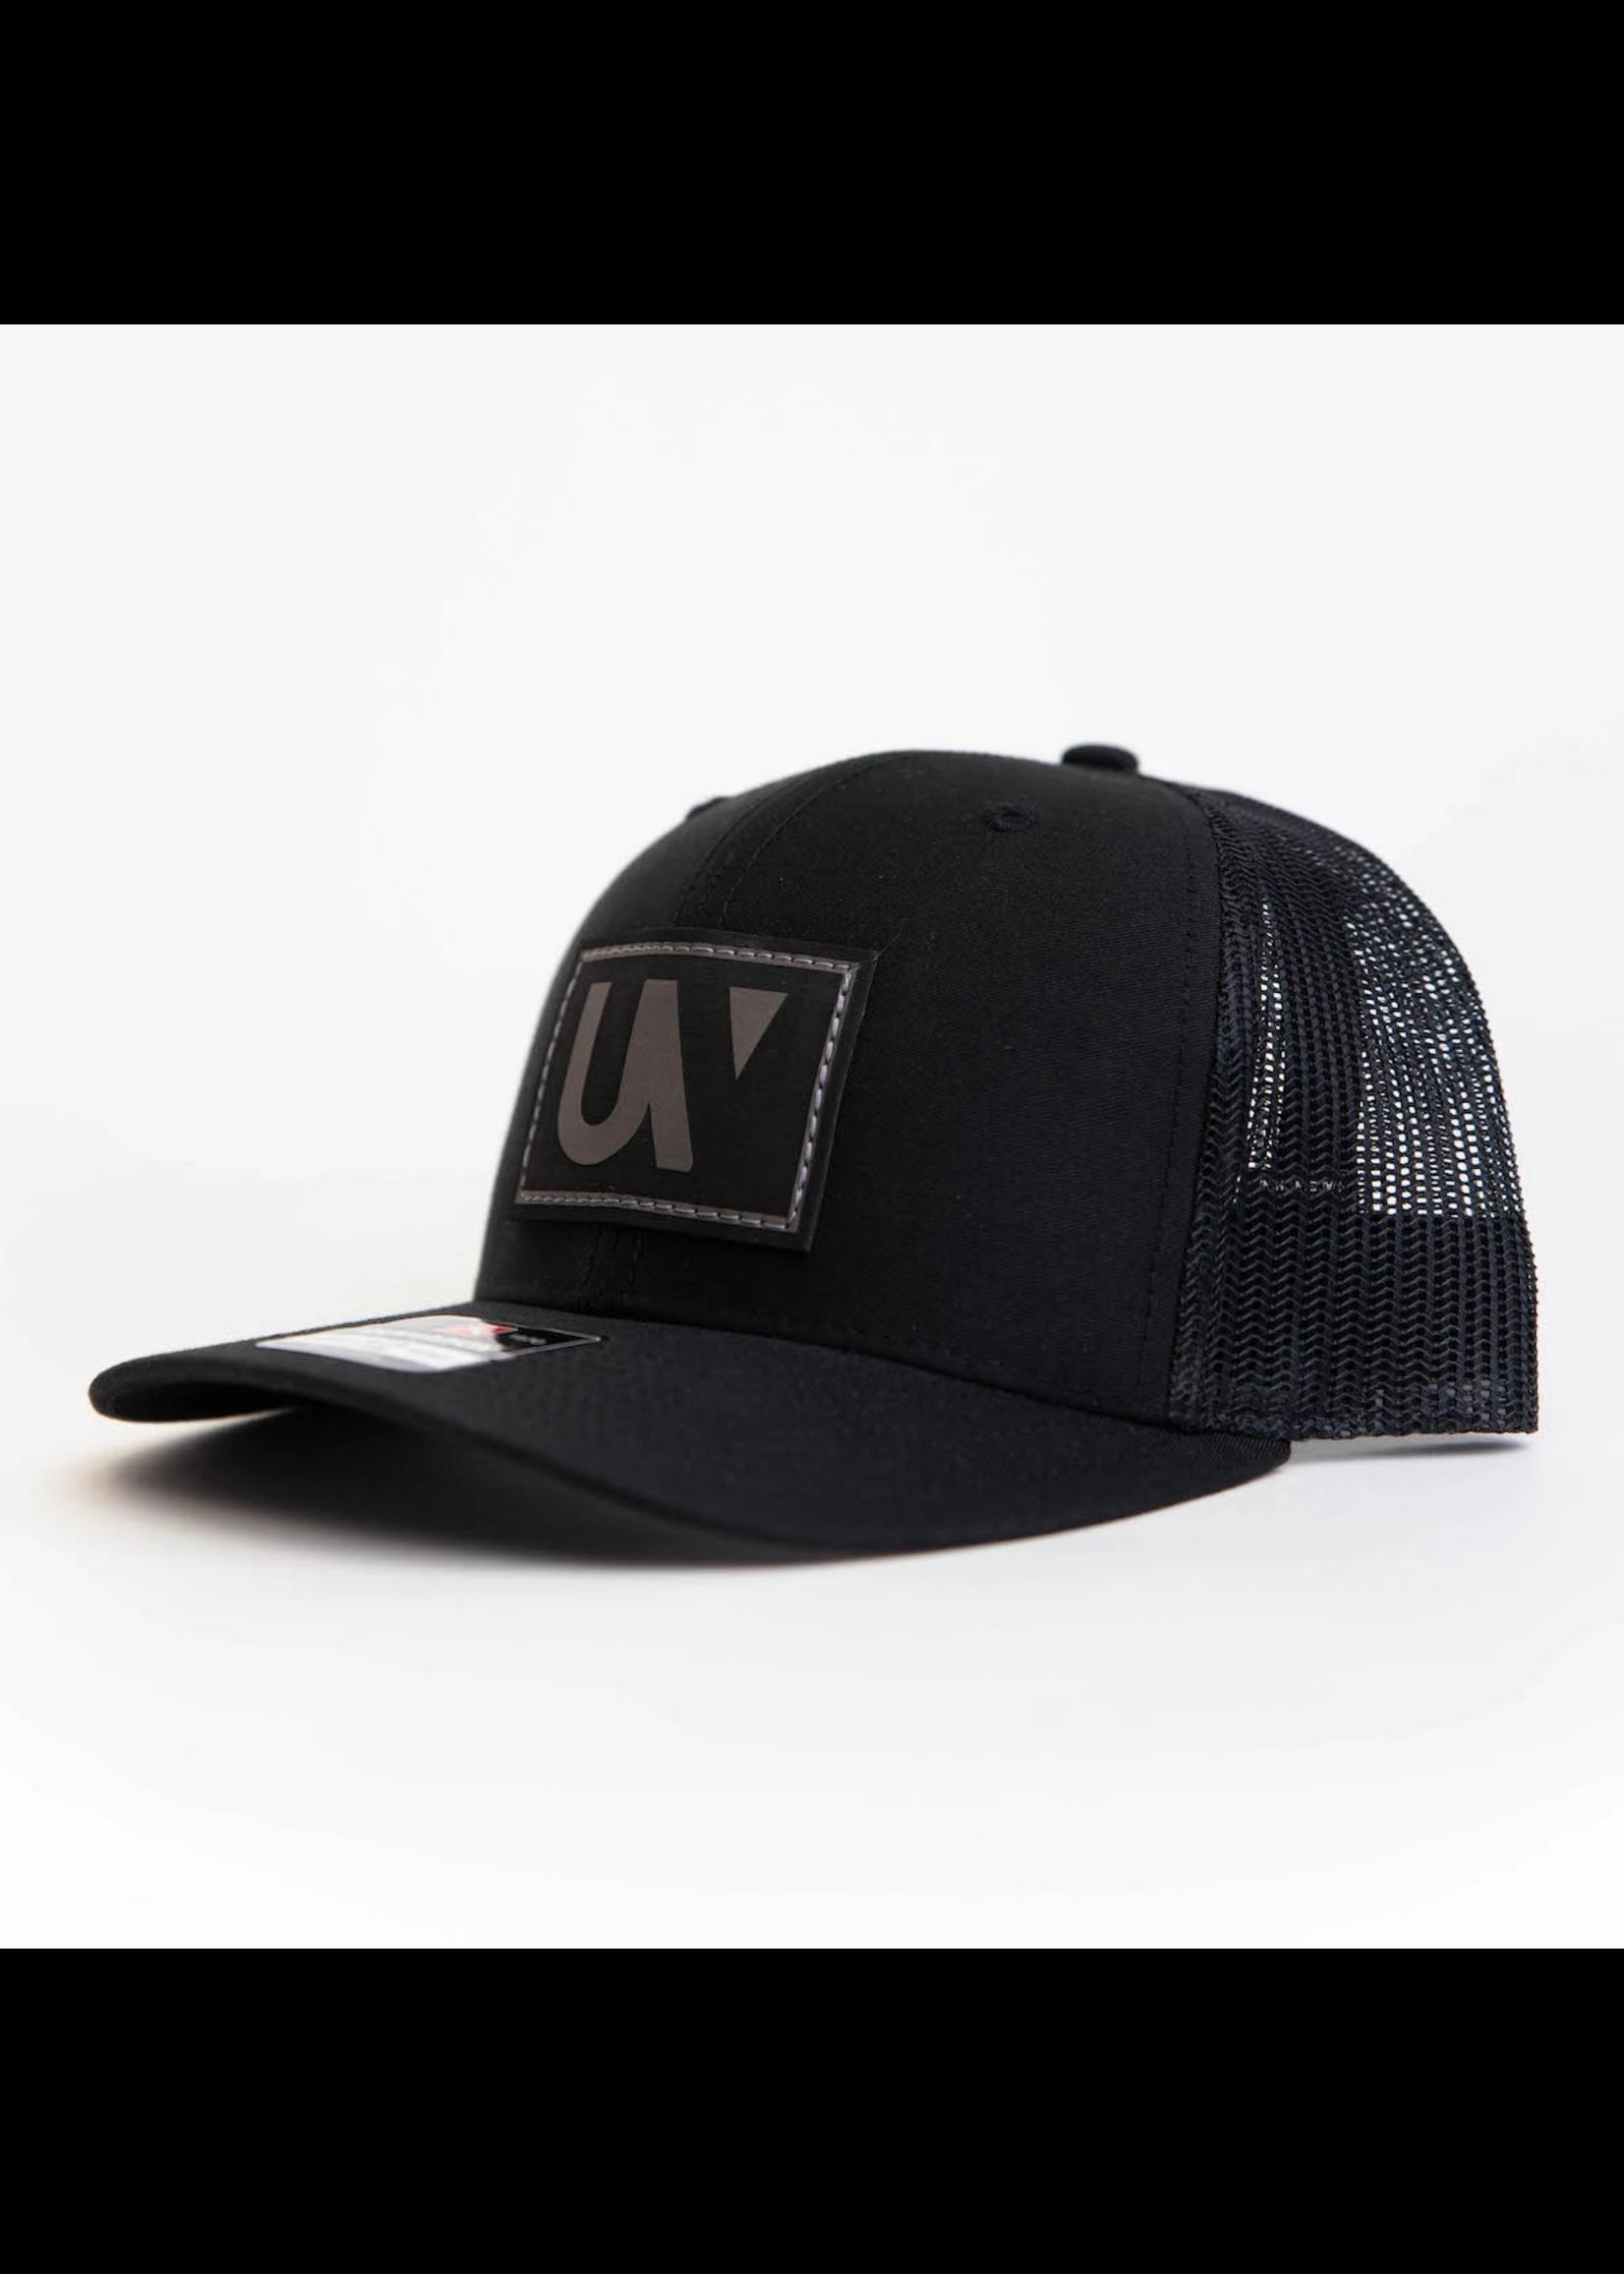 UltraView Ultraview Patch Cap